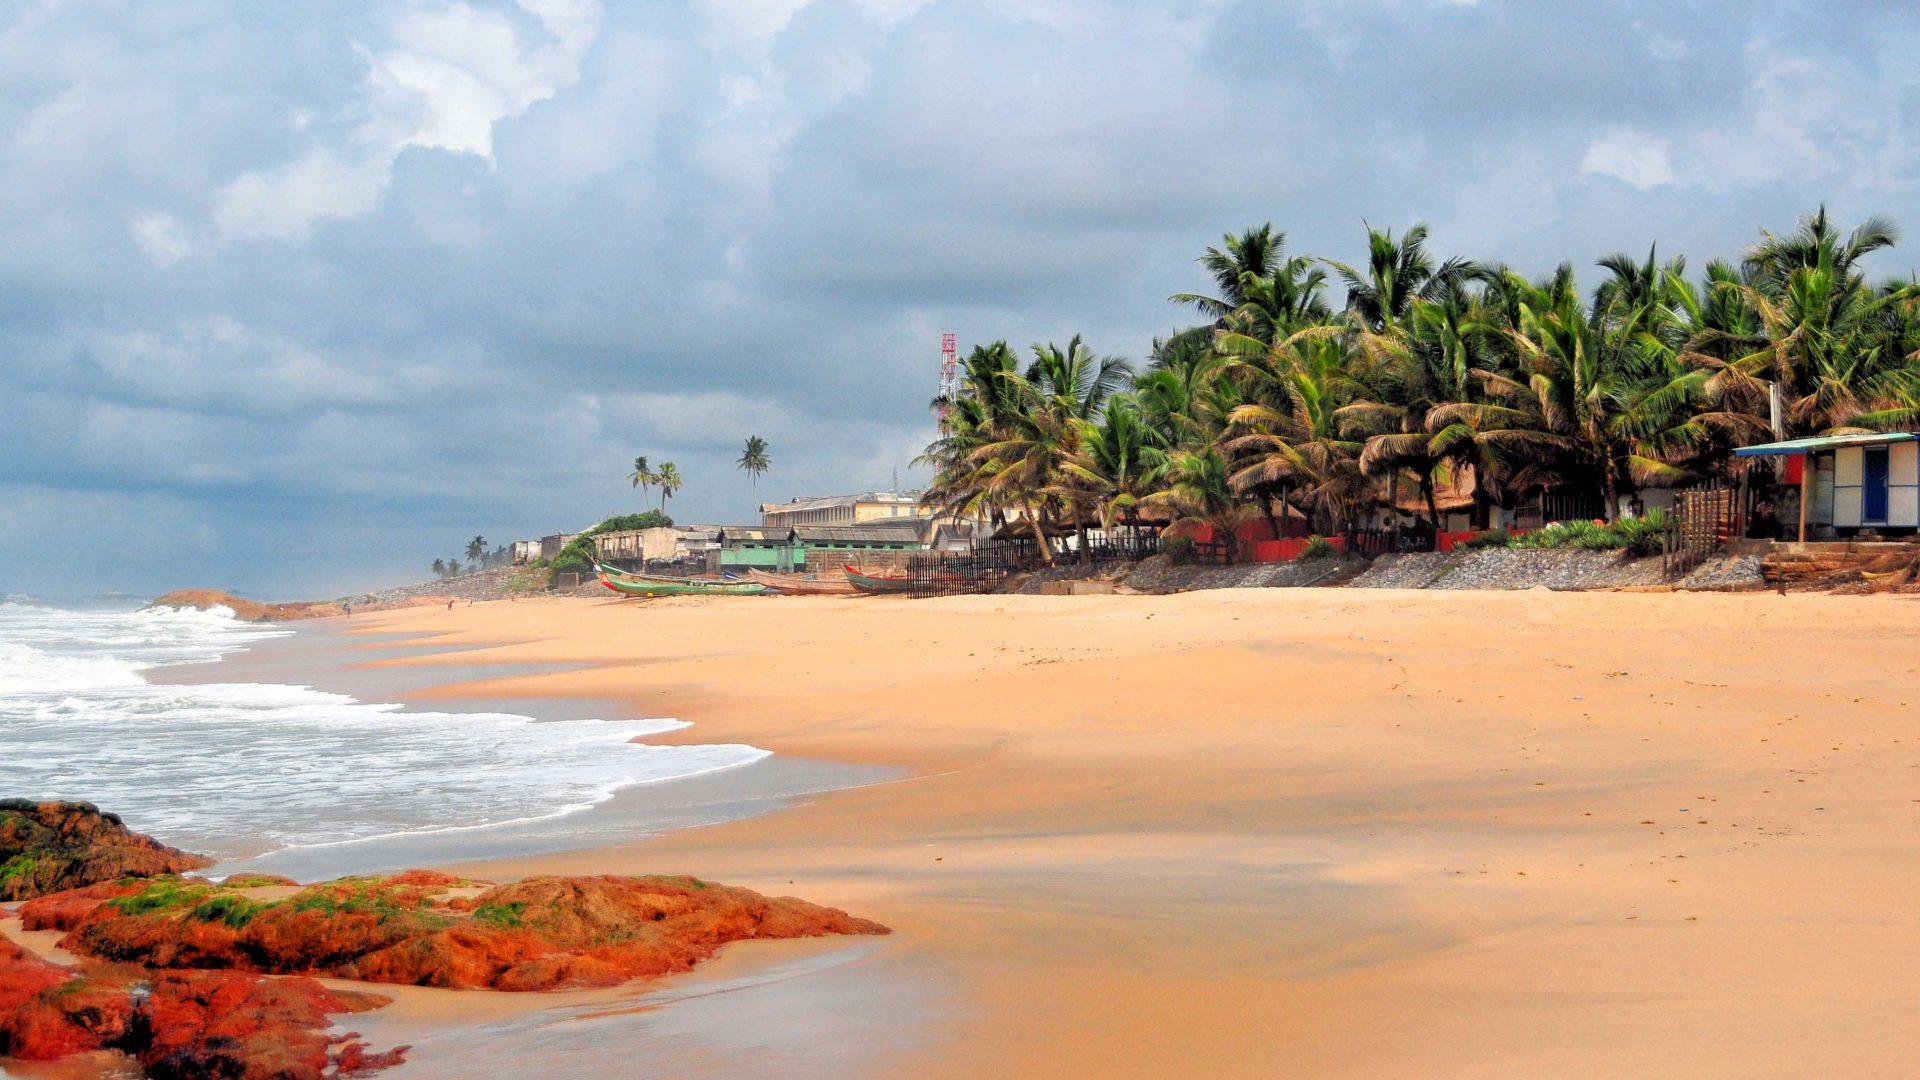 ghana the new canary islands or not quite adventure com